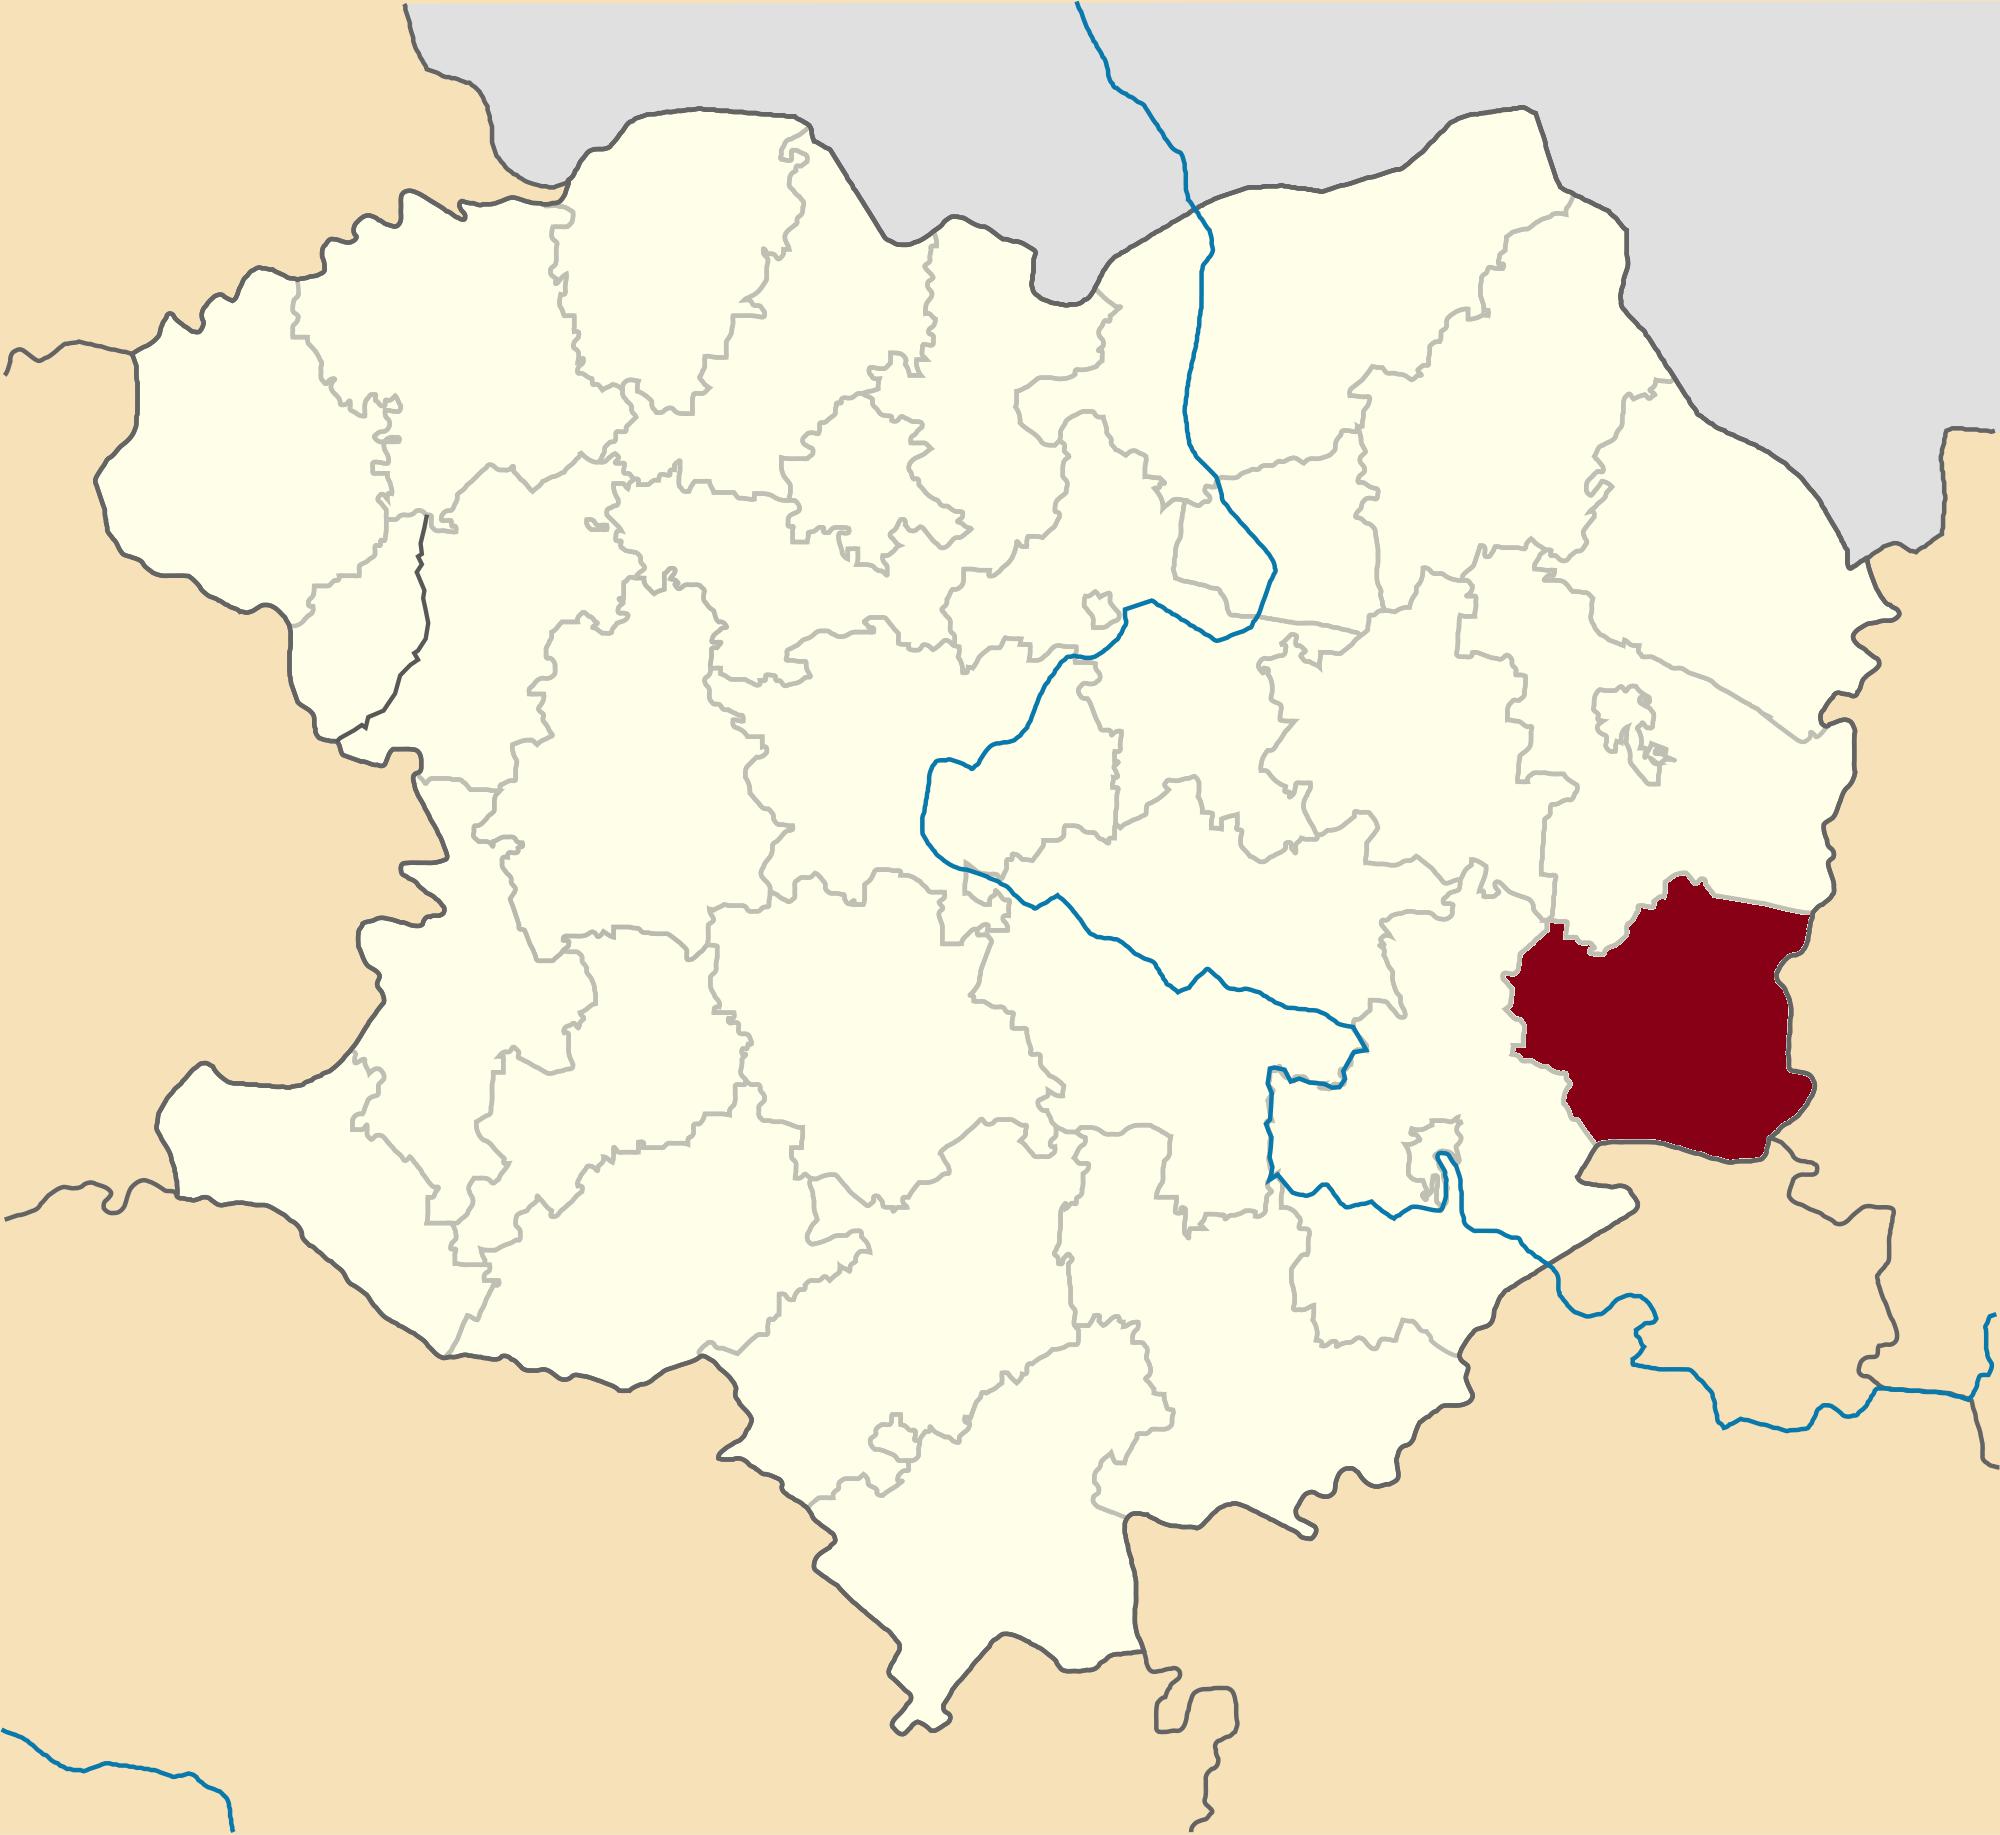 https://upload.wikimedia.org/wikipedia/commons/5/55/Borivskyi-Raion.png